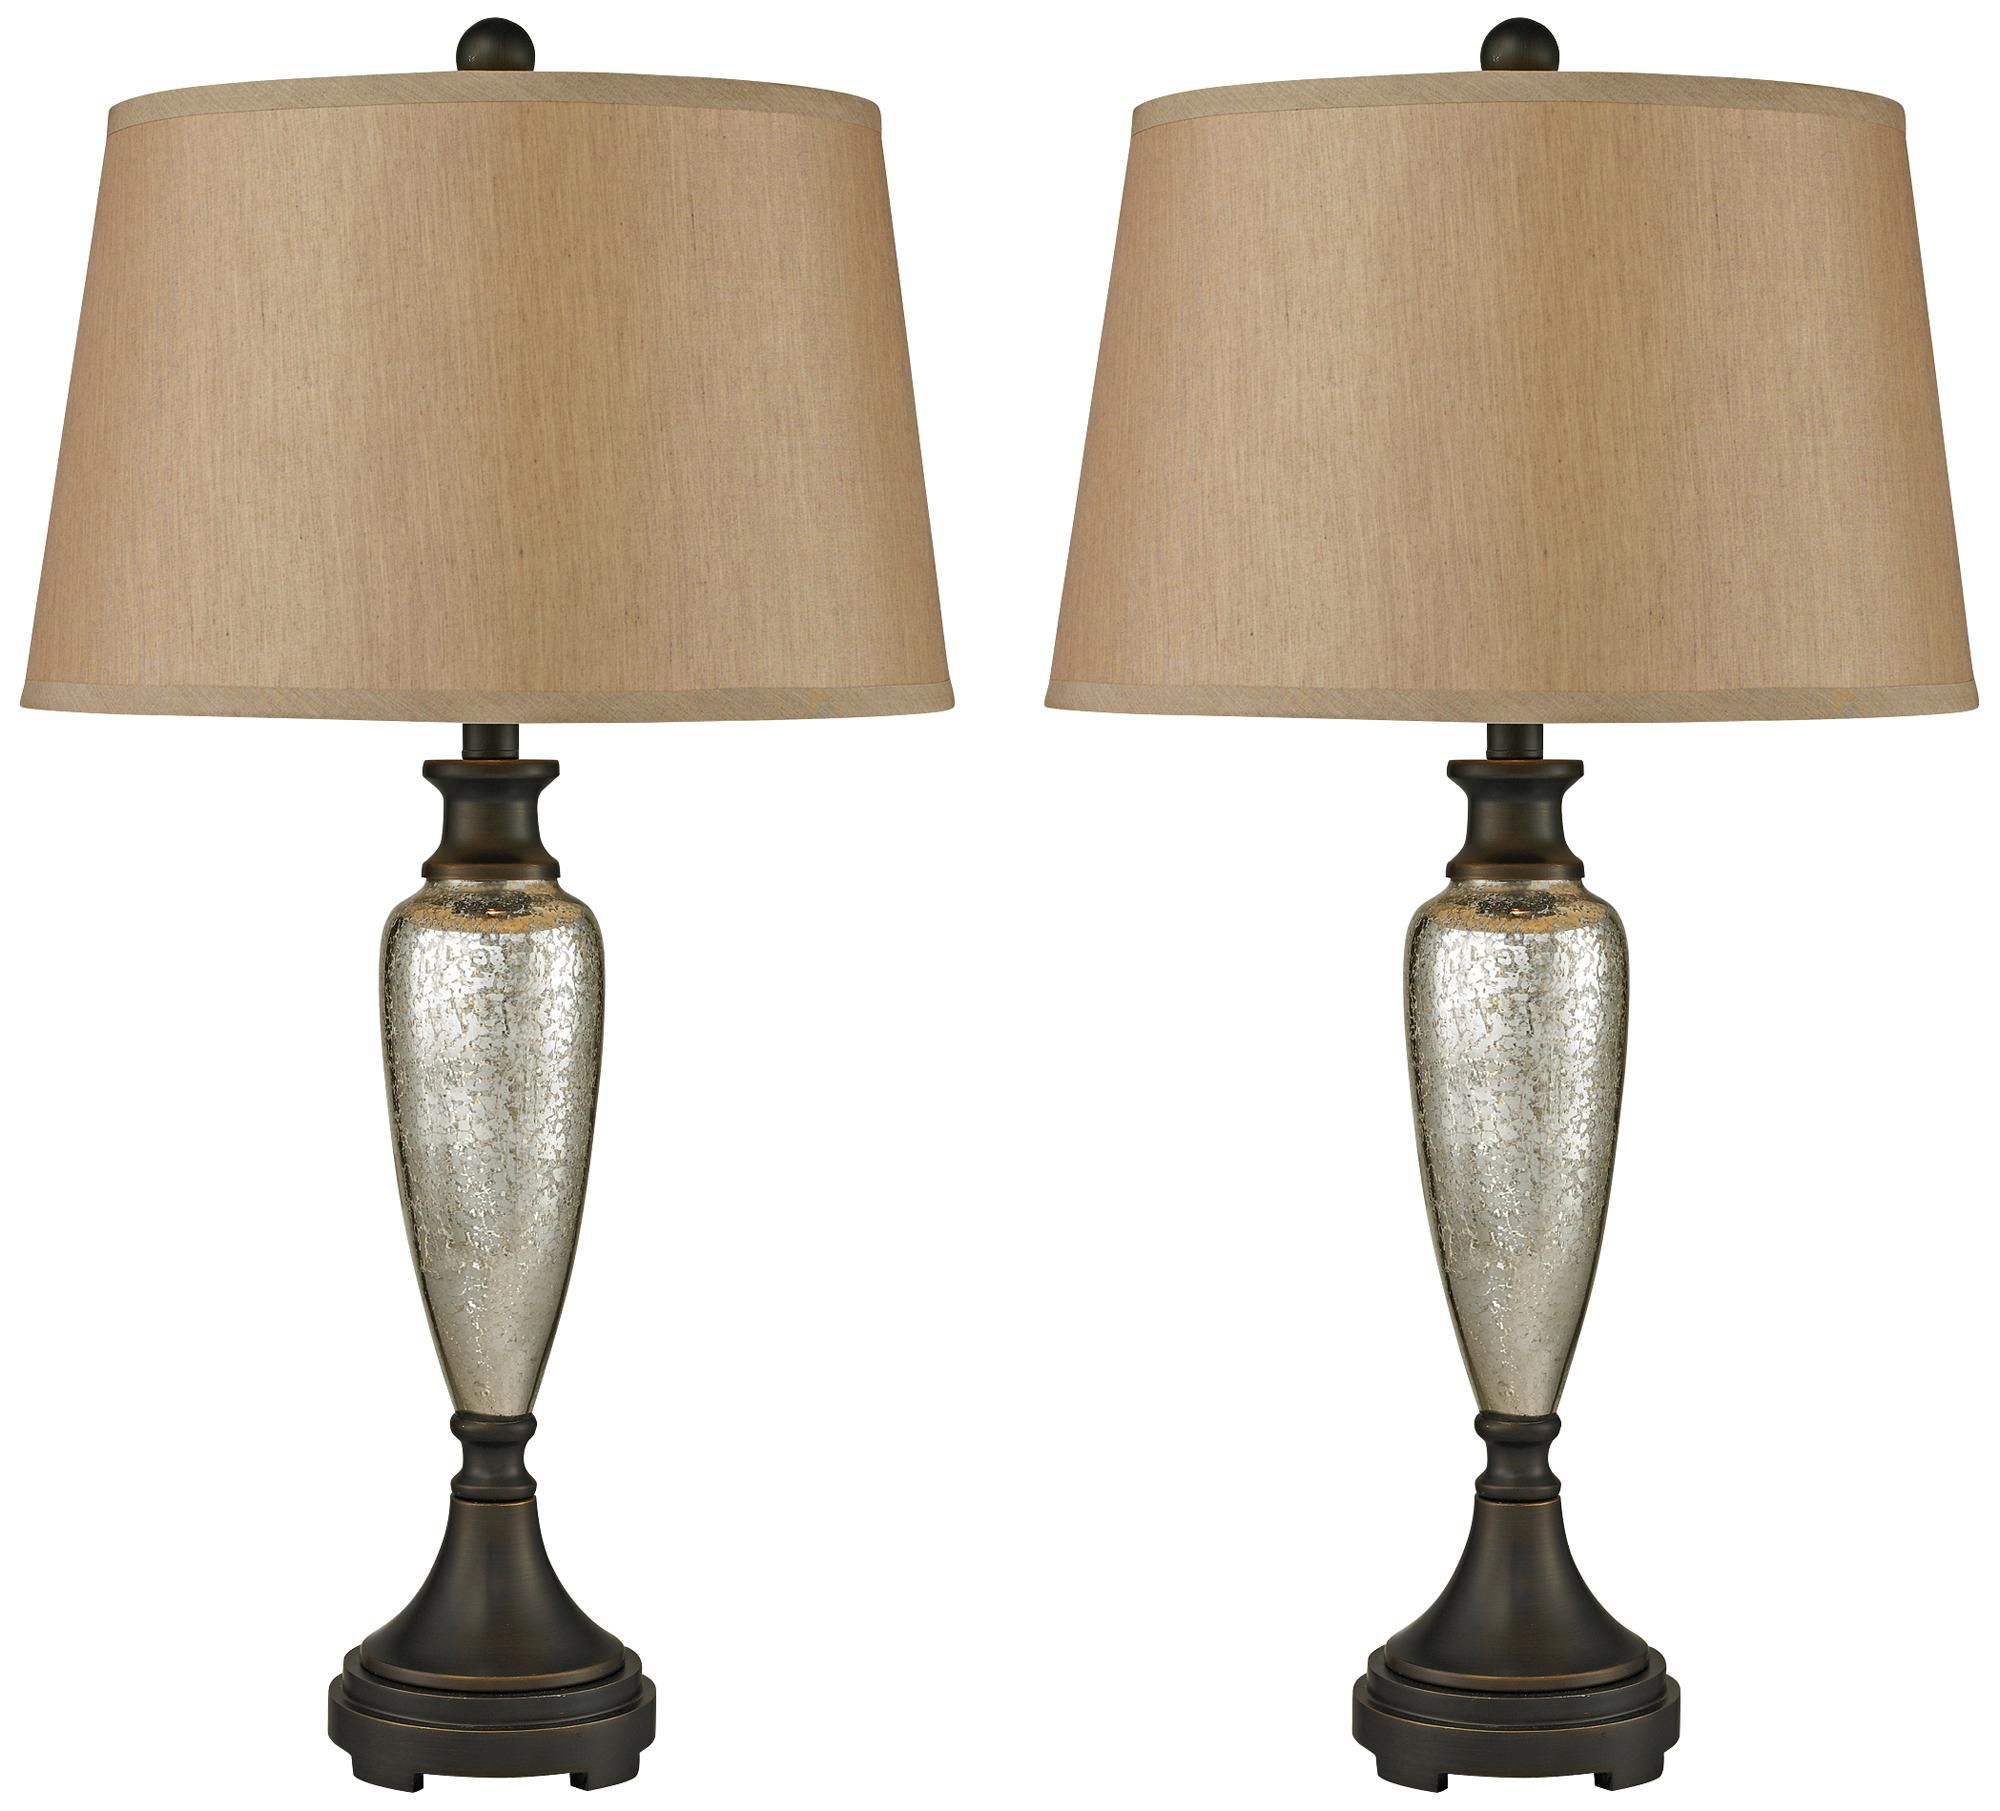 Dimond Caledon Antique Mercury Glass Table Lamp Set Of 2